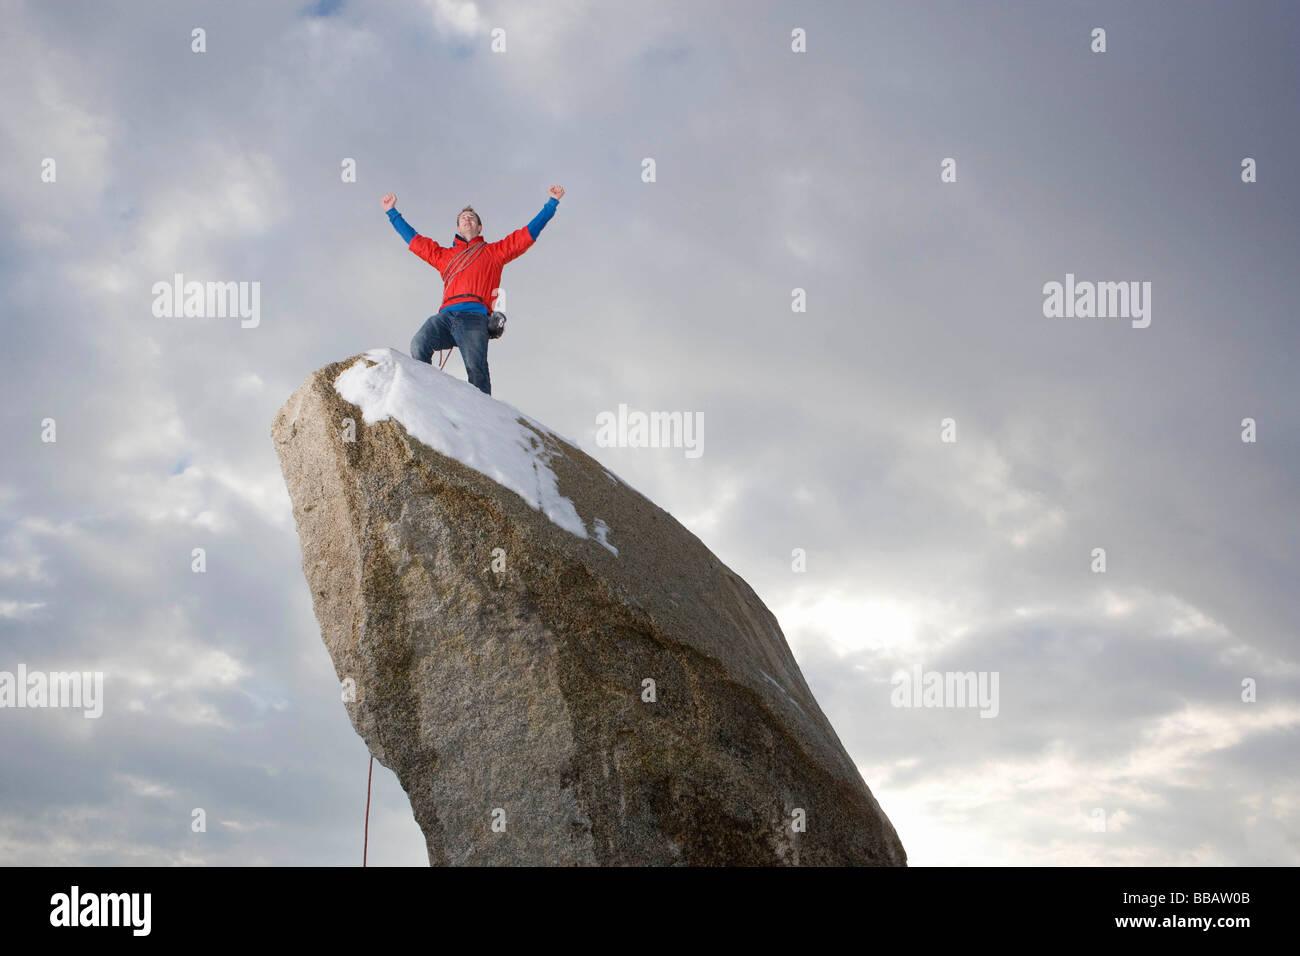 climber celebrating on snow capped peak - Stock Image